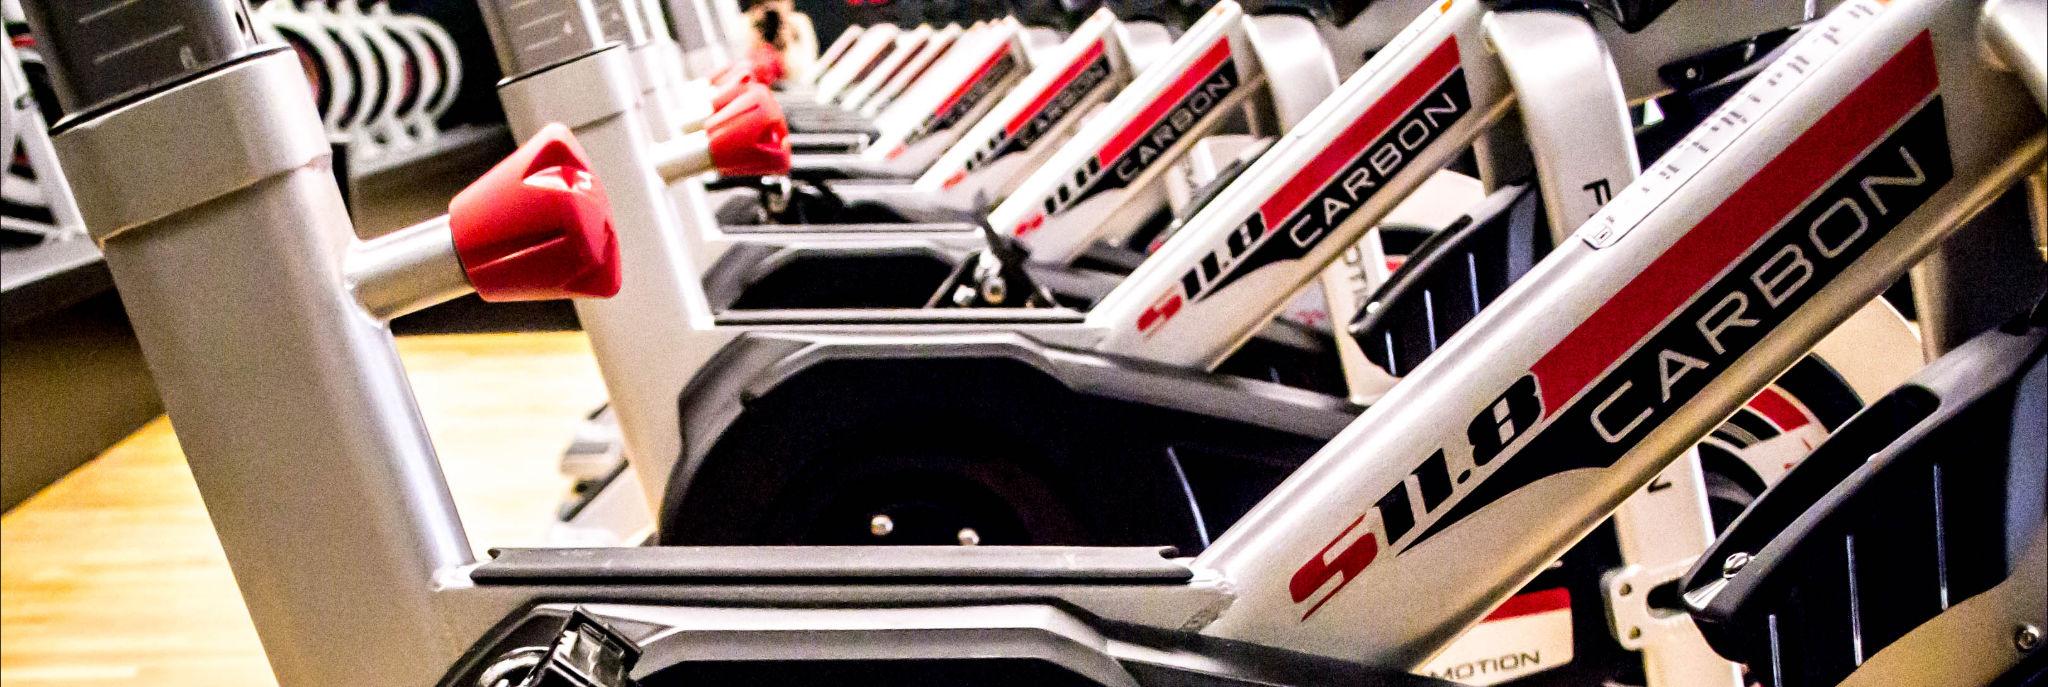 Spin Studio Saint Paul Athletic Club Fitness Workout Bike Biking Minnesota